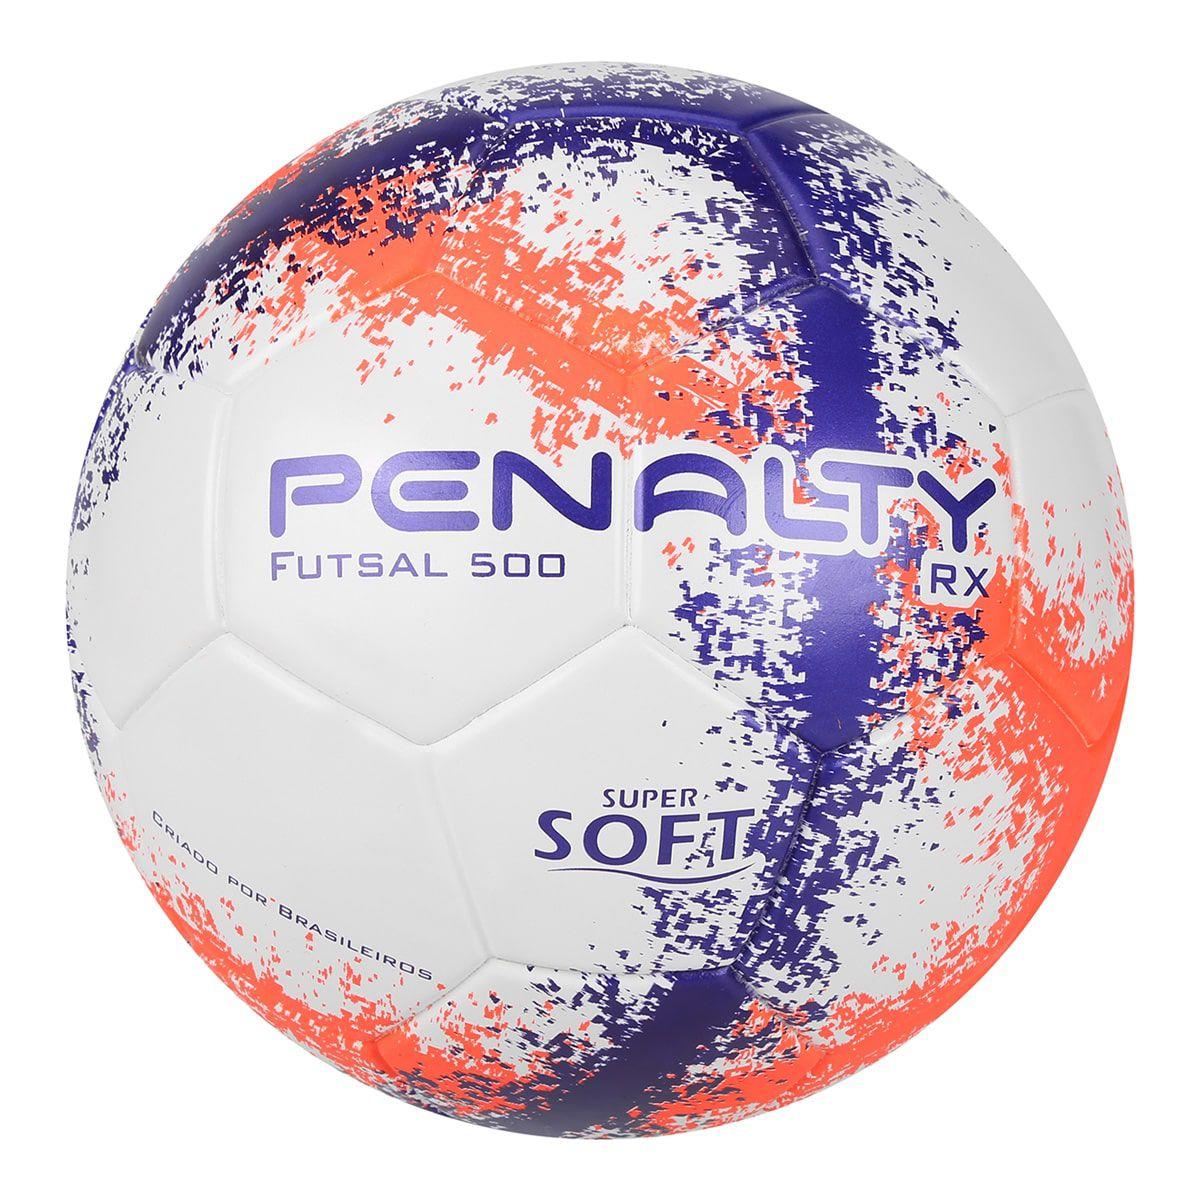 Kit C/6 Bolas Futsal Penalty RX 500 R3 Fusion VIII